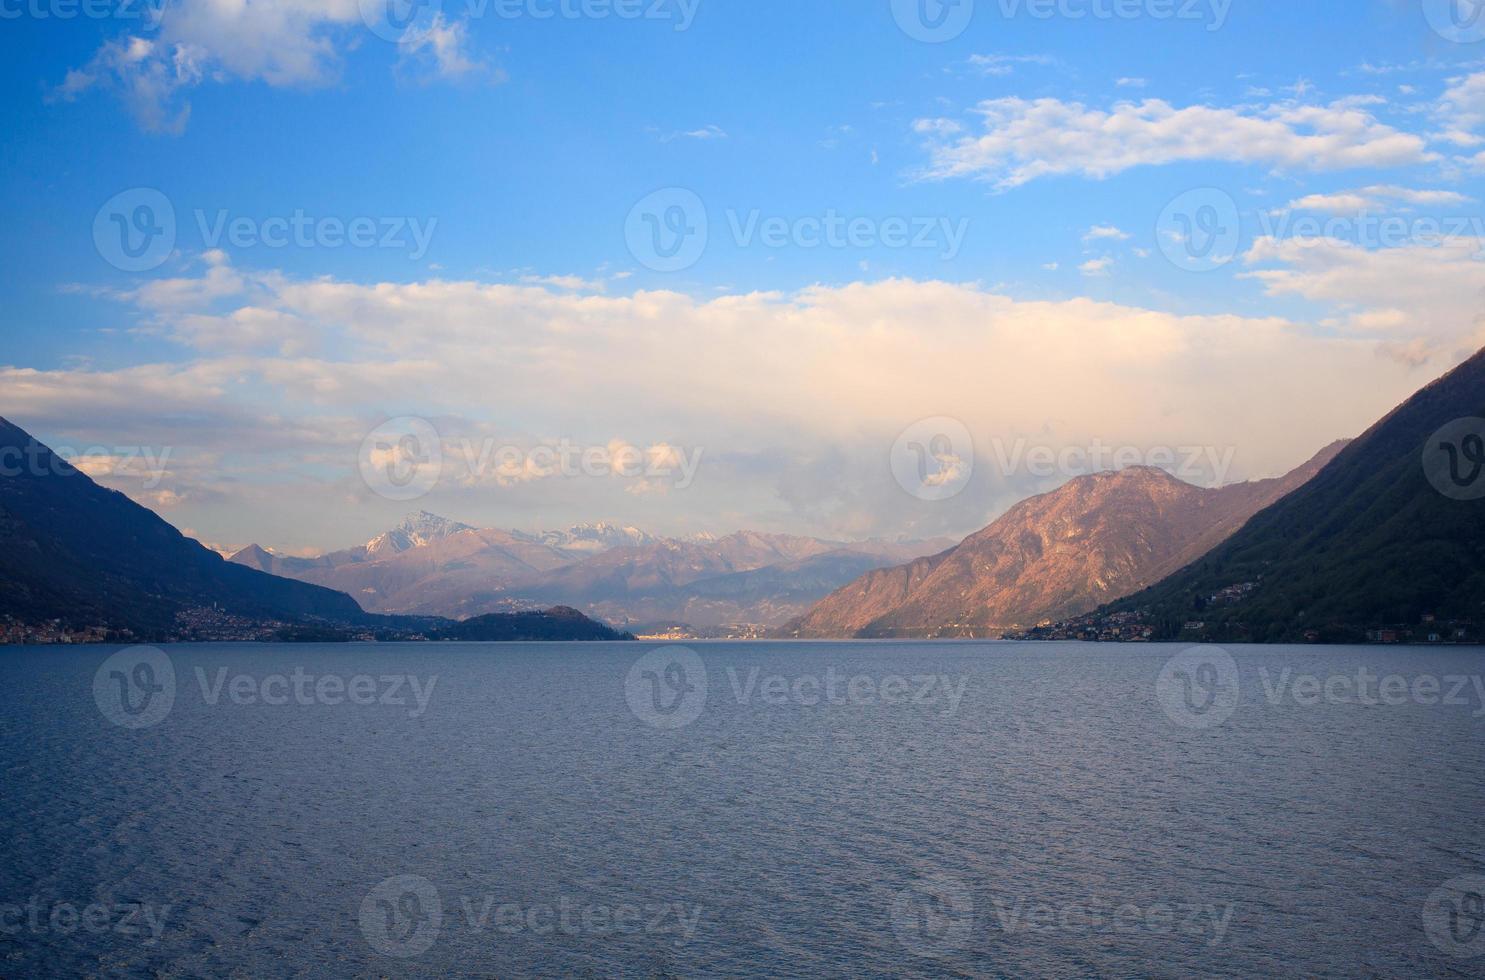 lago lugano o lago ceresio foto